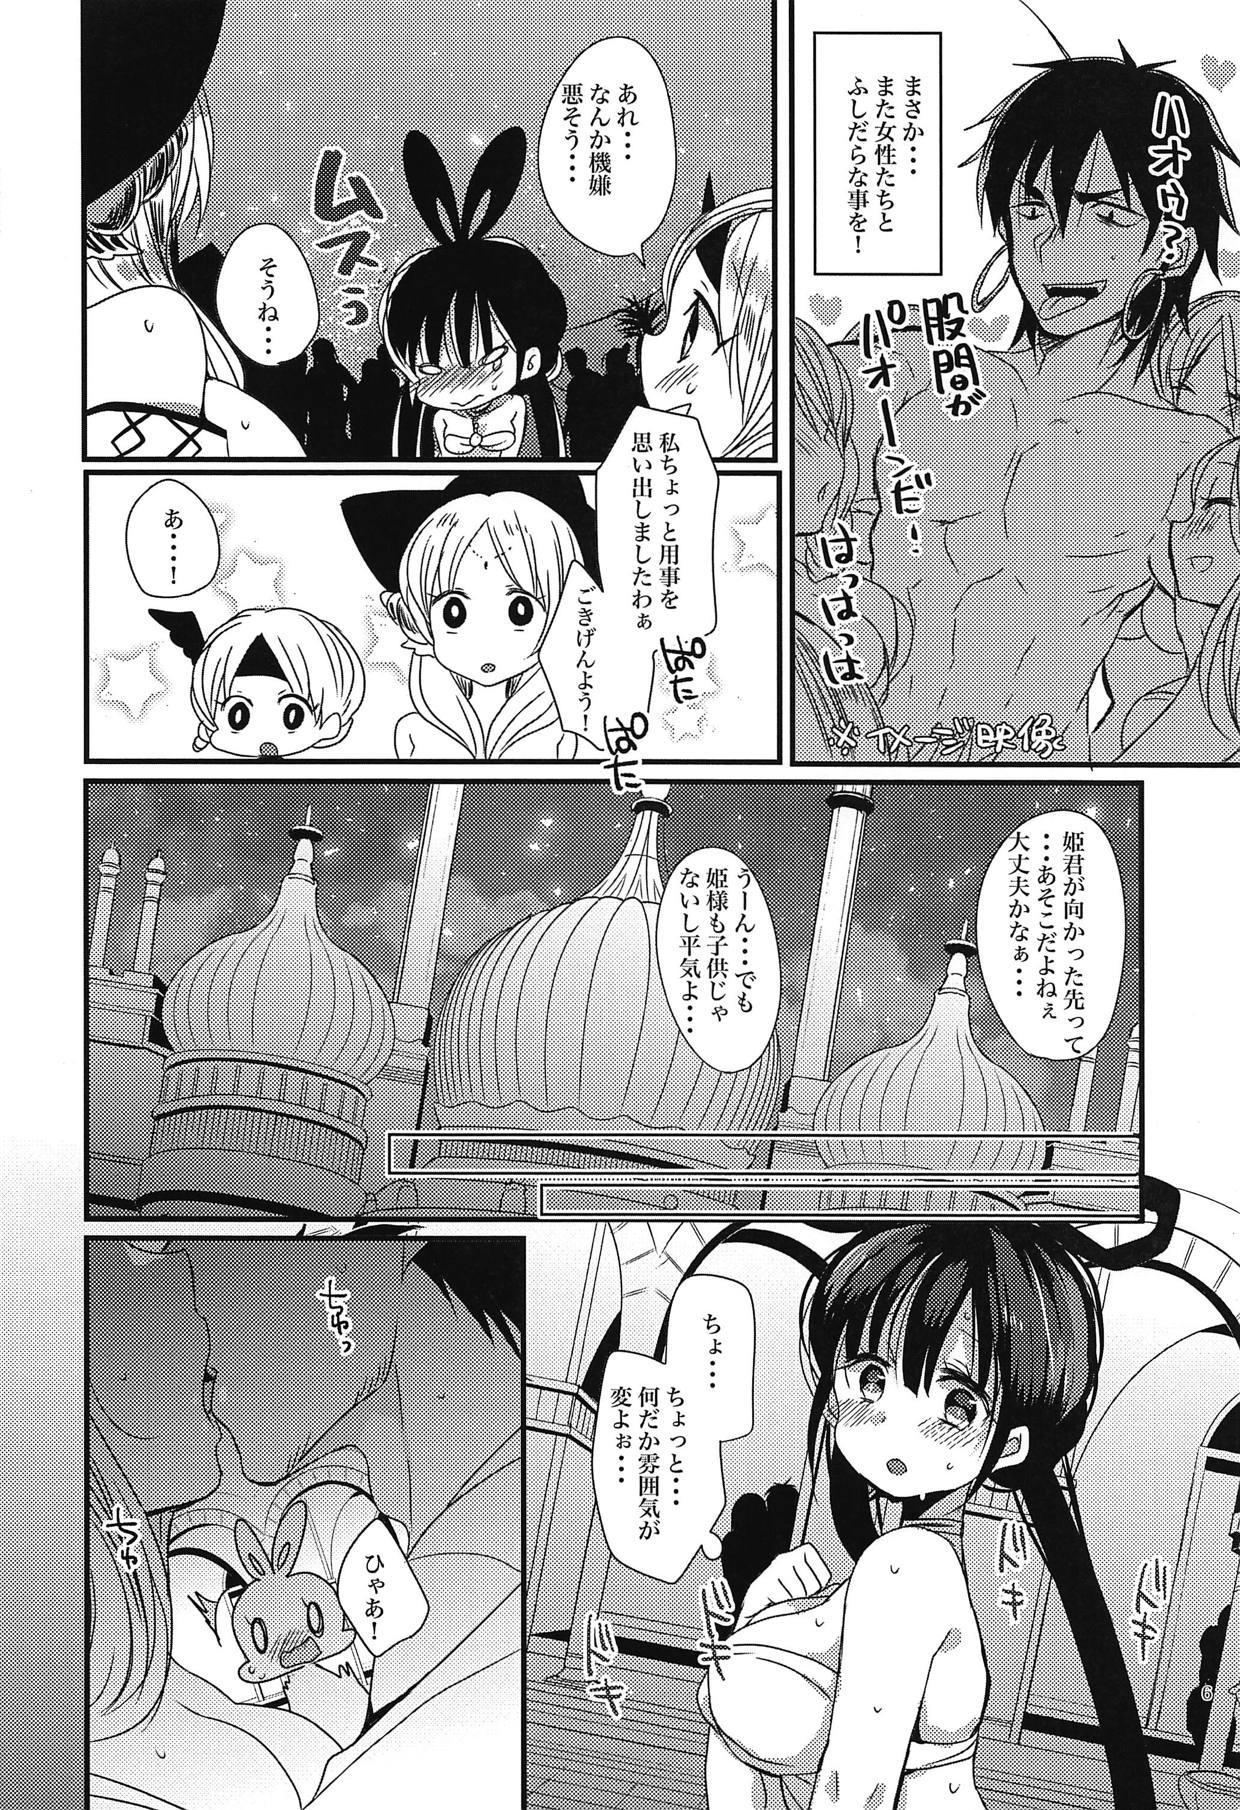 Himegimi wa Koyoi mo Ou-sama to 4